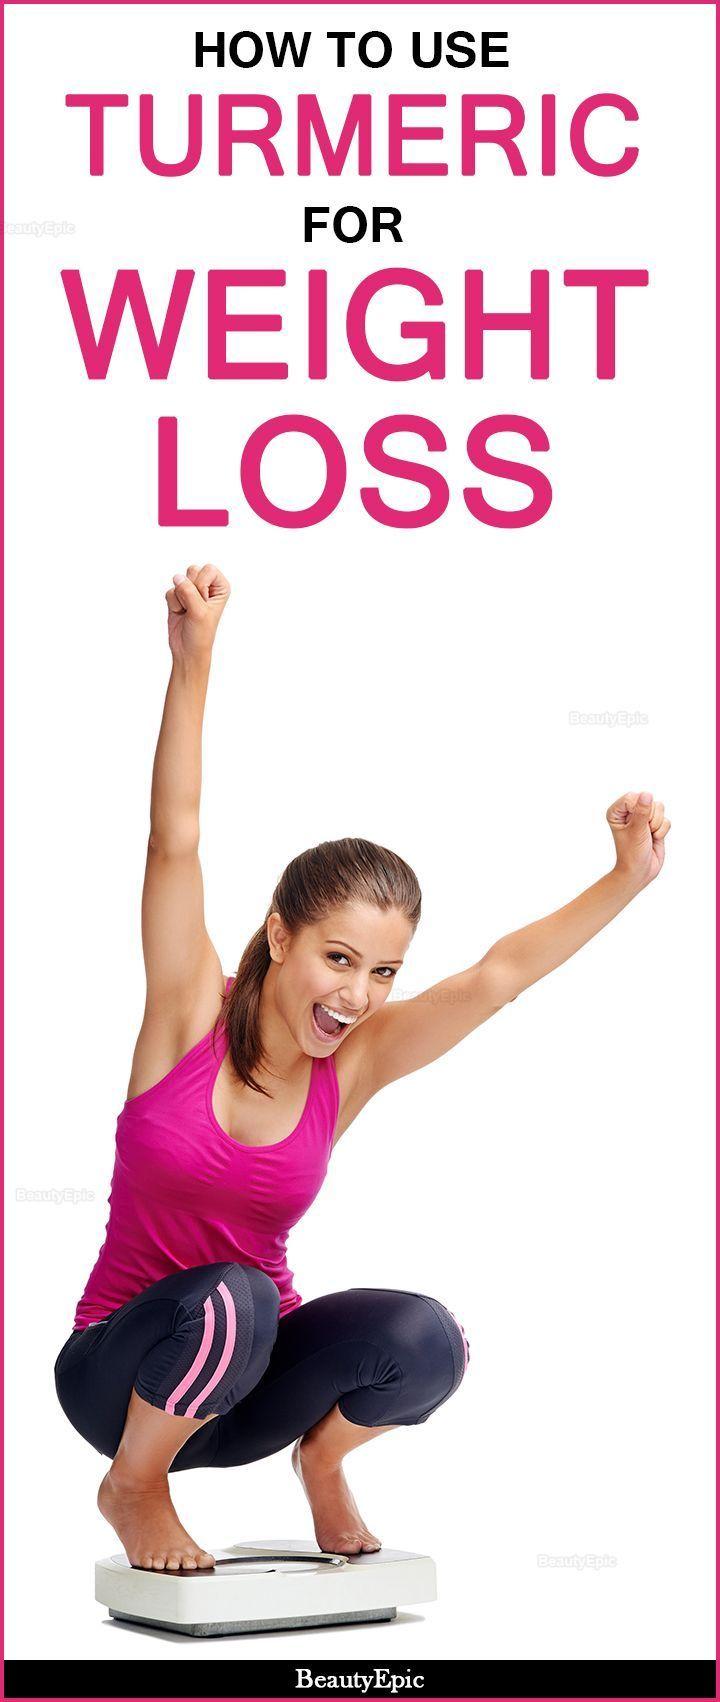 Diet for fast weight loss tips #quickweightlosstips :) | how to lose weight rapidly#weightlossgoals #weightlosssupport #weightloss